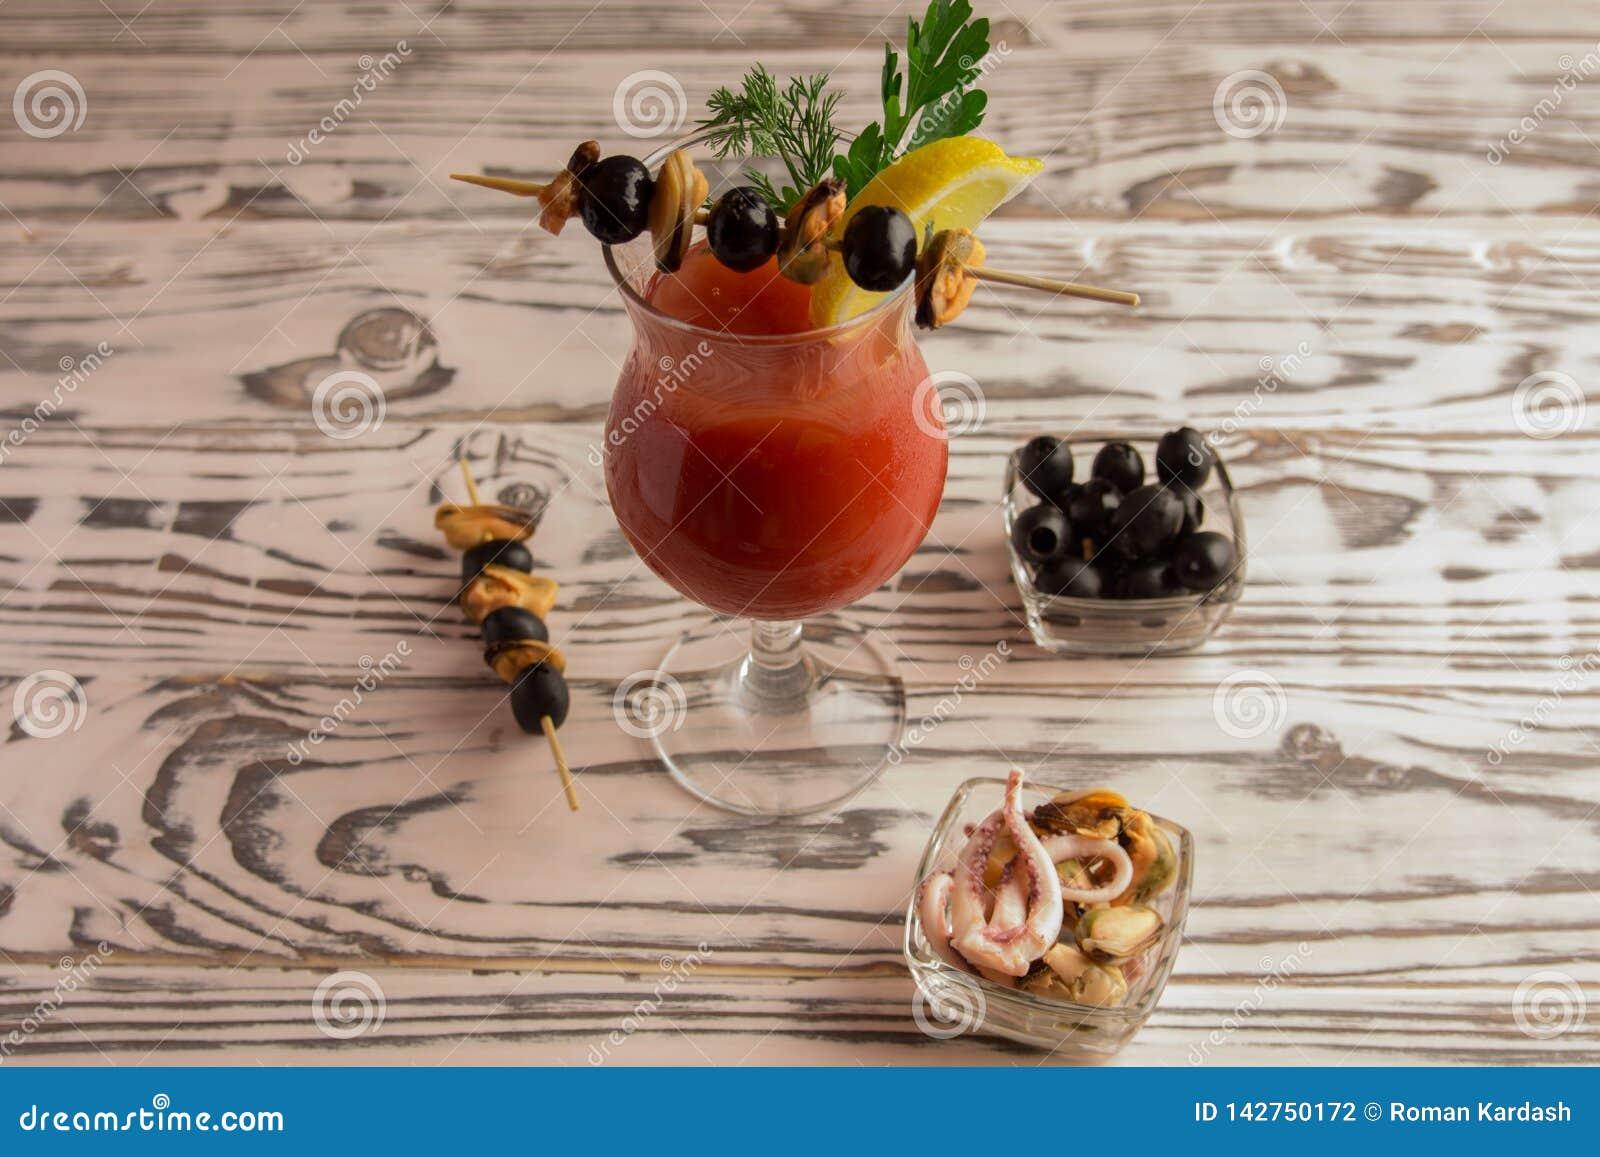 Cocktail bloedige Mary, die een cocktail maken